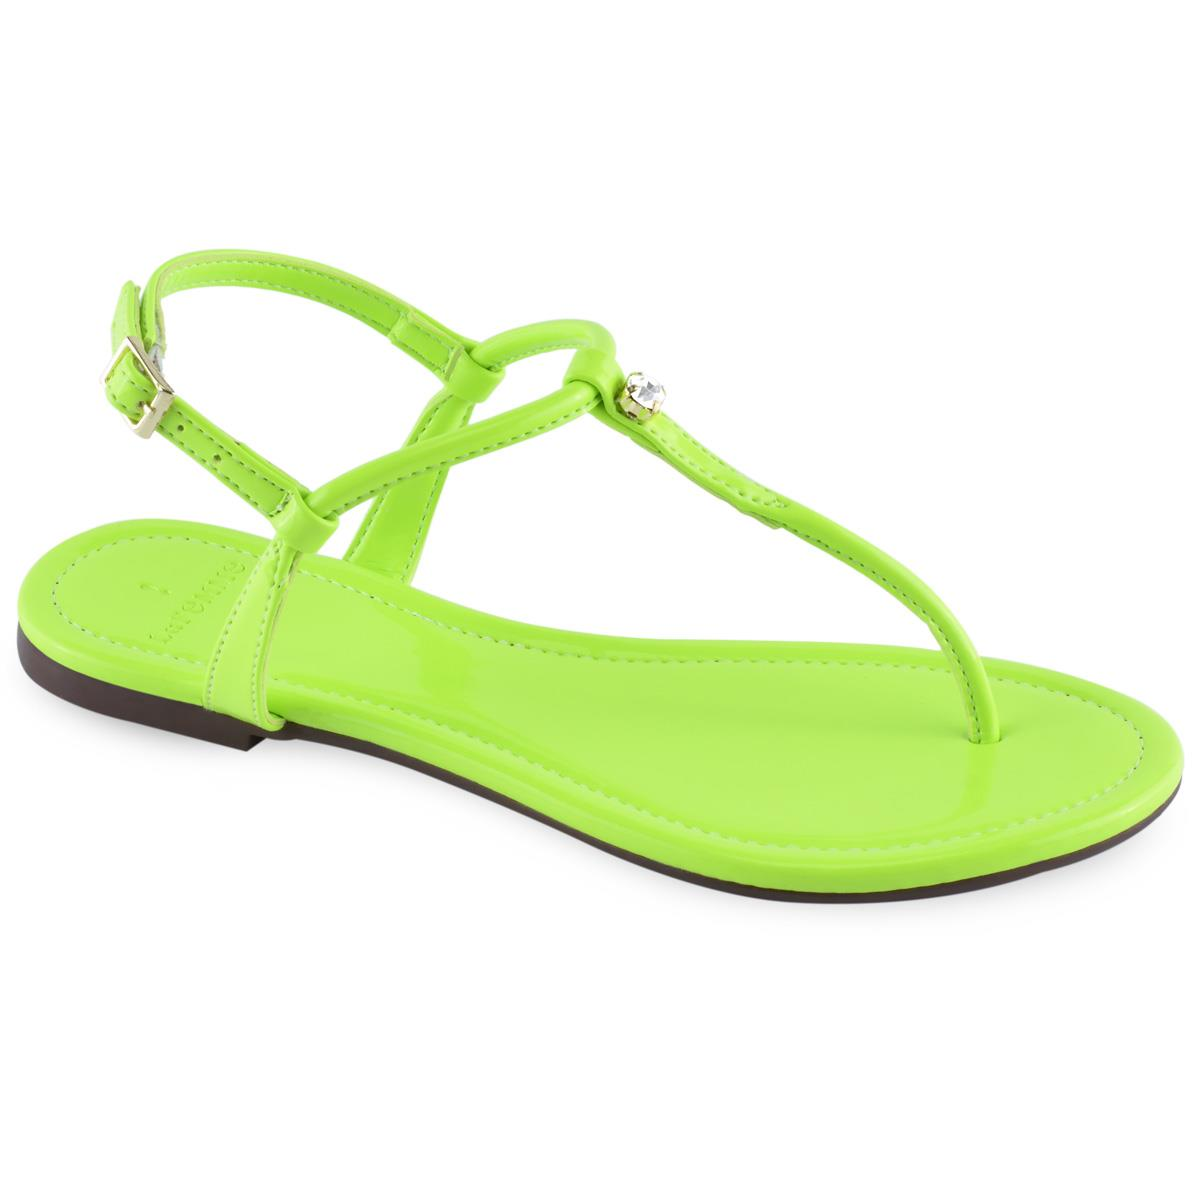 d482fc93be Sandália Flat La Femme Colors Verniz Verde Neon. Ampliar